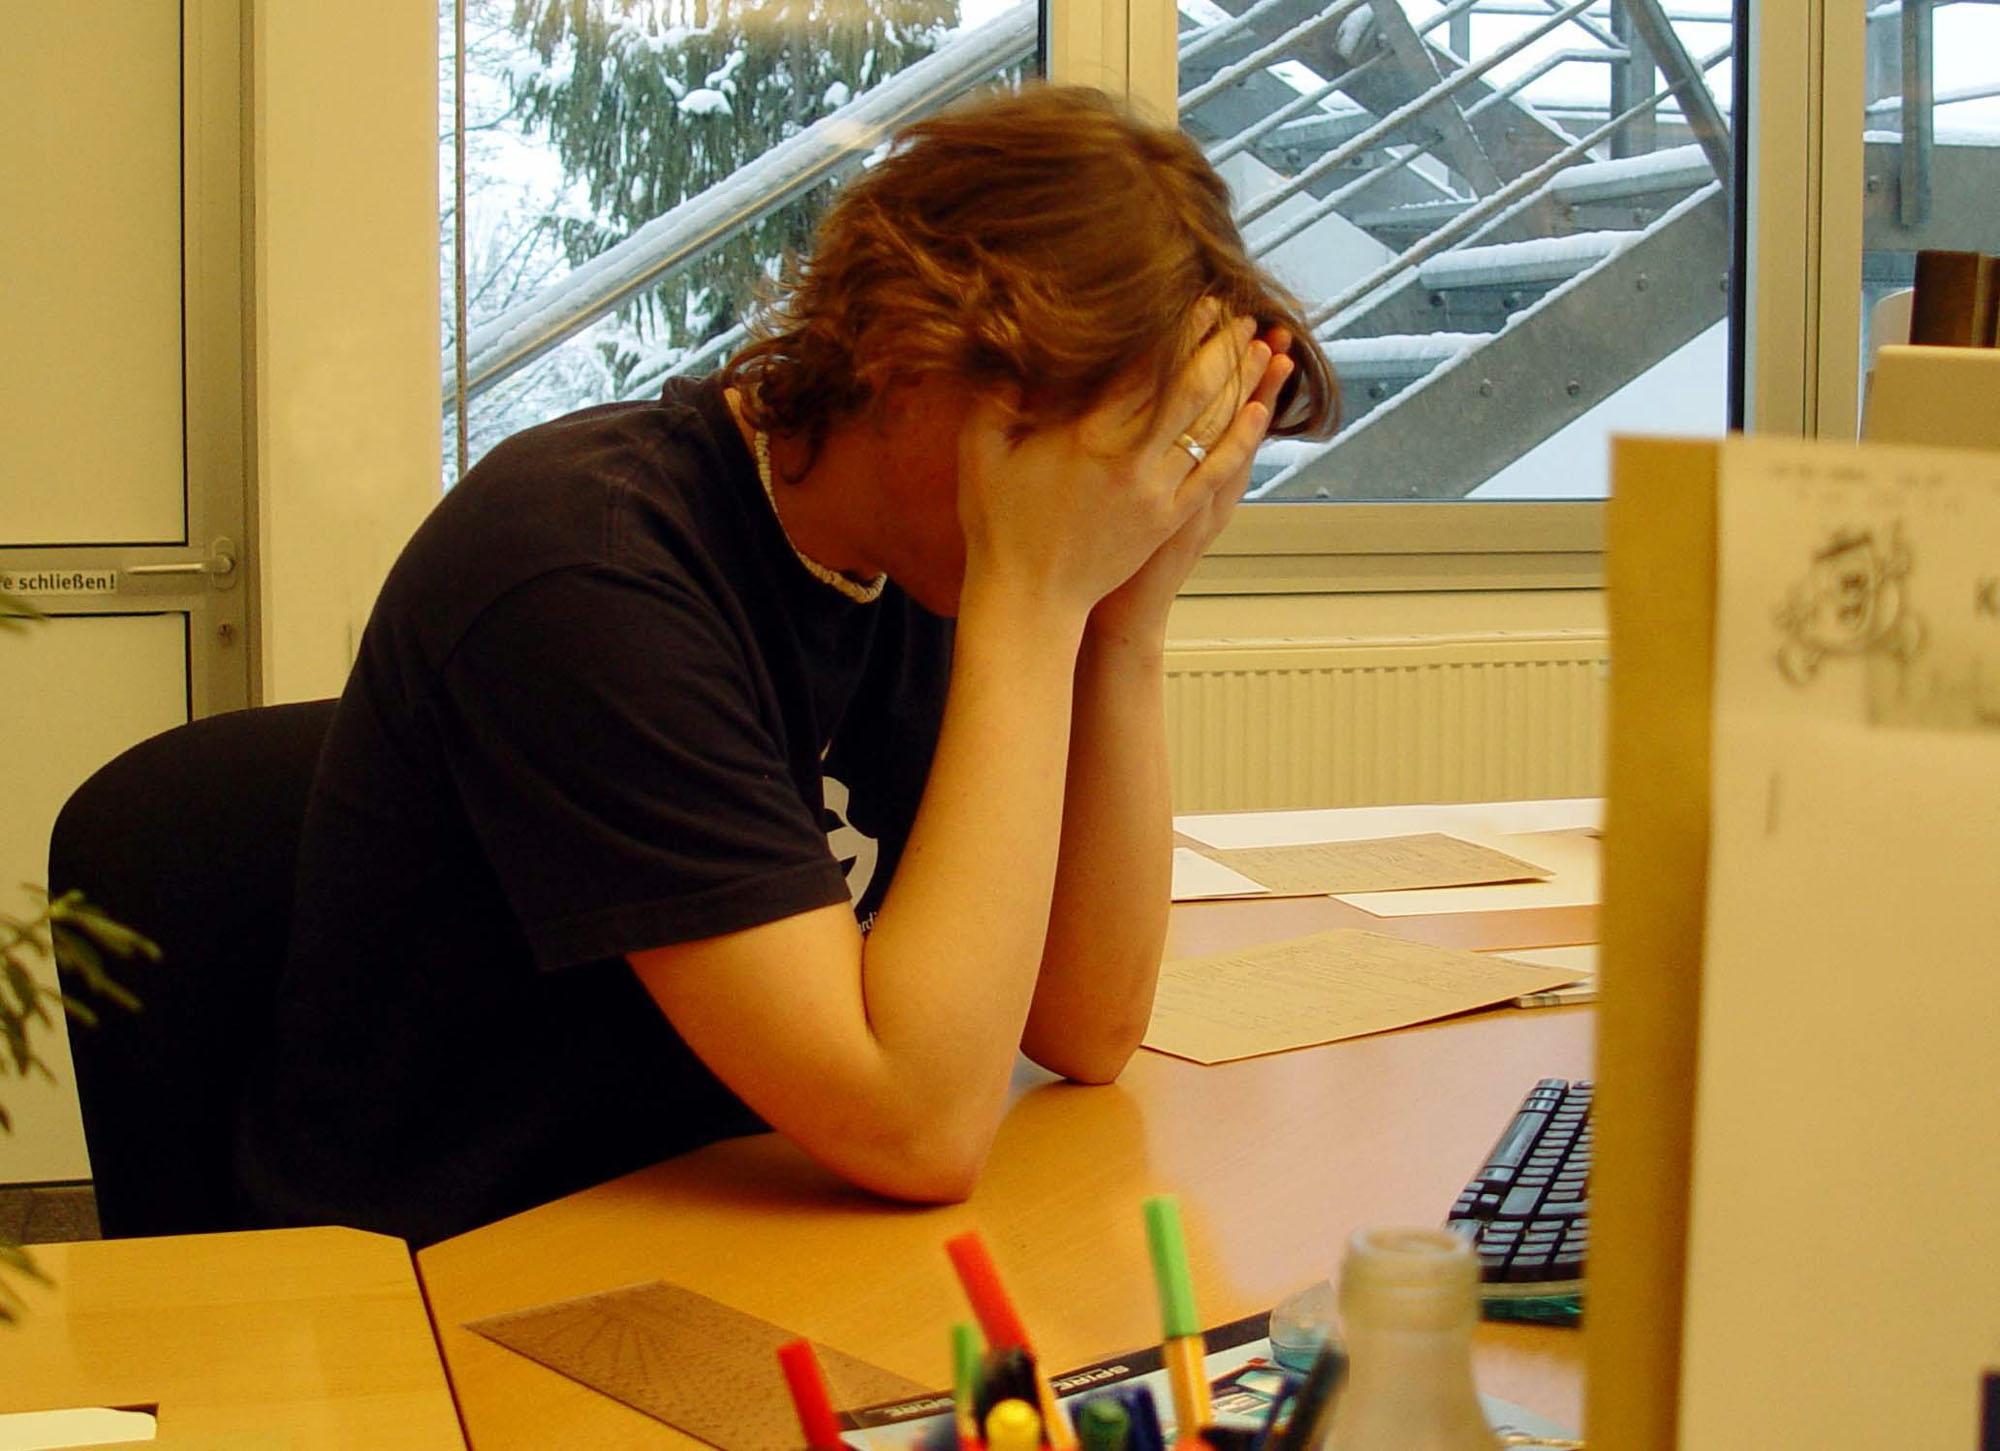 hypnotherapy_blackheath_stress_at_work_stress_at_work